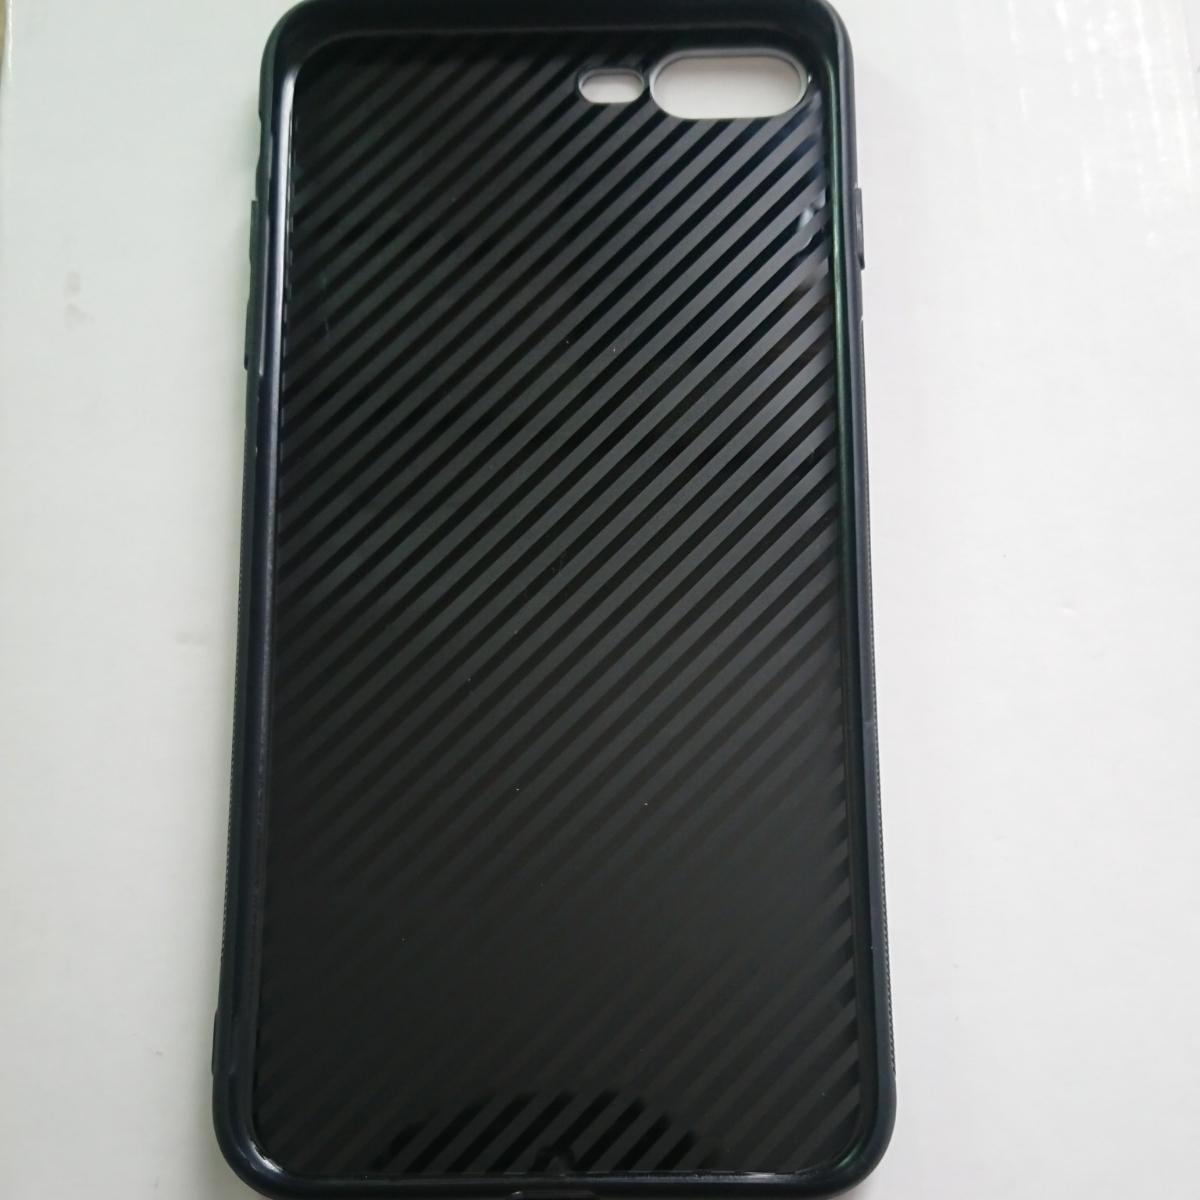 e66218985f ベヨネッタ2 BAYONETTA iPhoneケースアイフォンケースTPU素材強化ガラス高品質光沢有りiPhone 7plus 8plus対応.  商品數量: :1